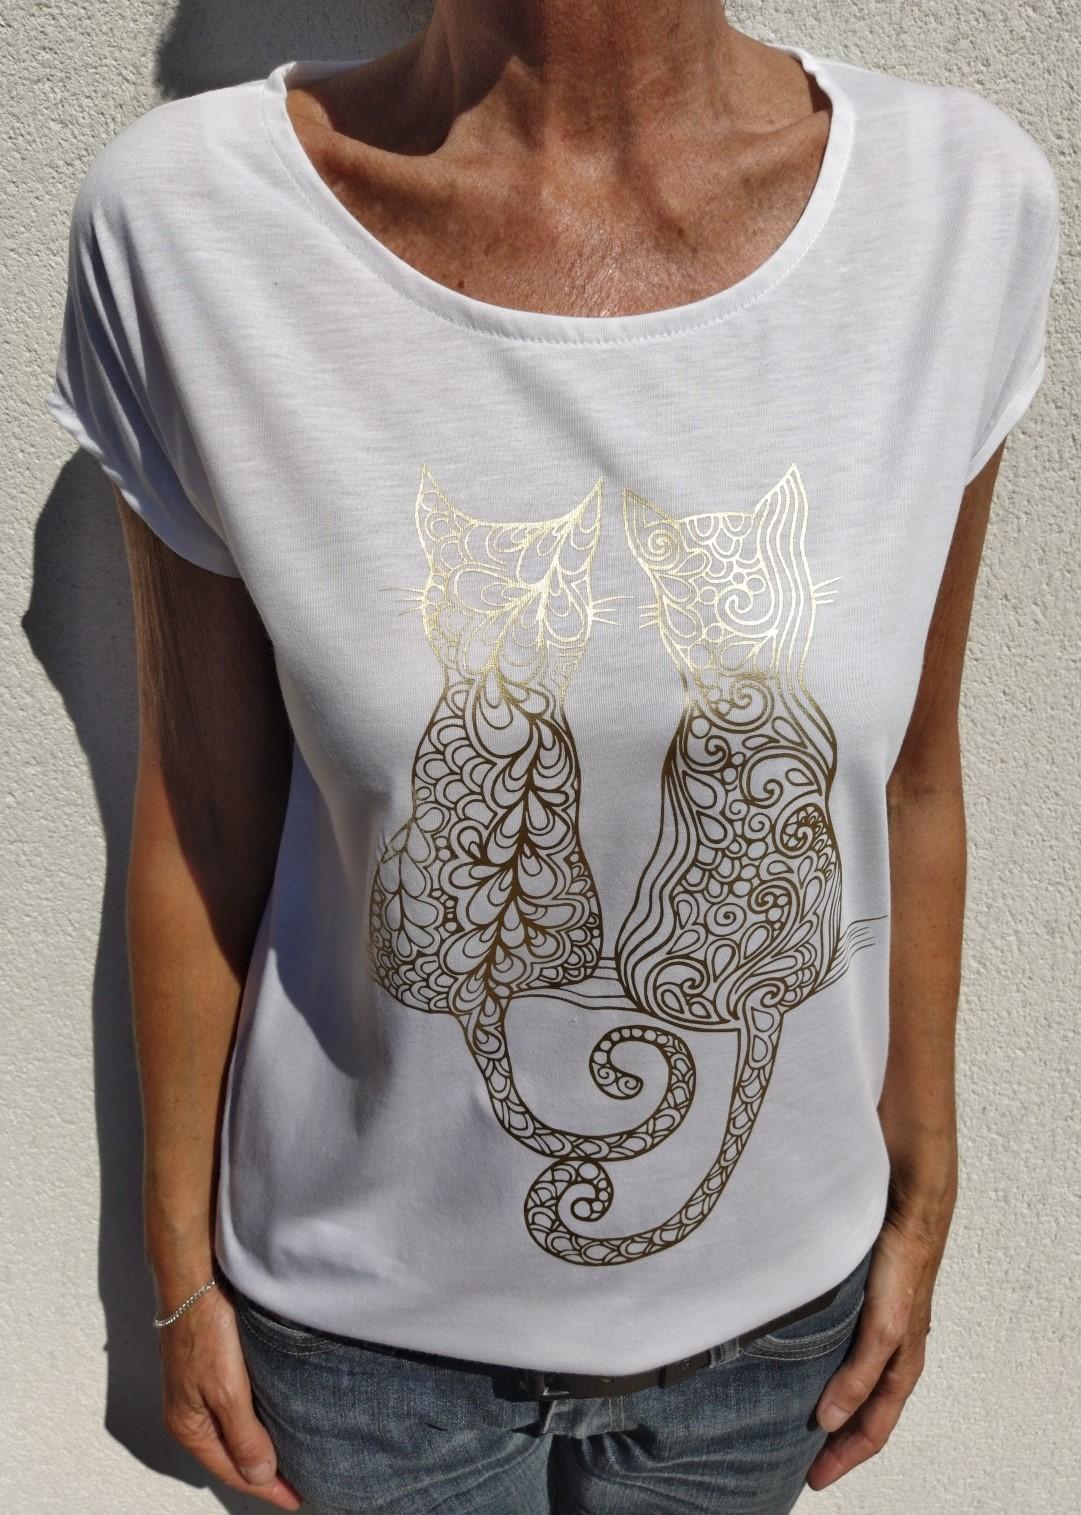 Tee shirt blanc N°55 chat or